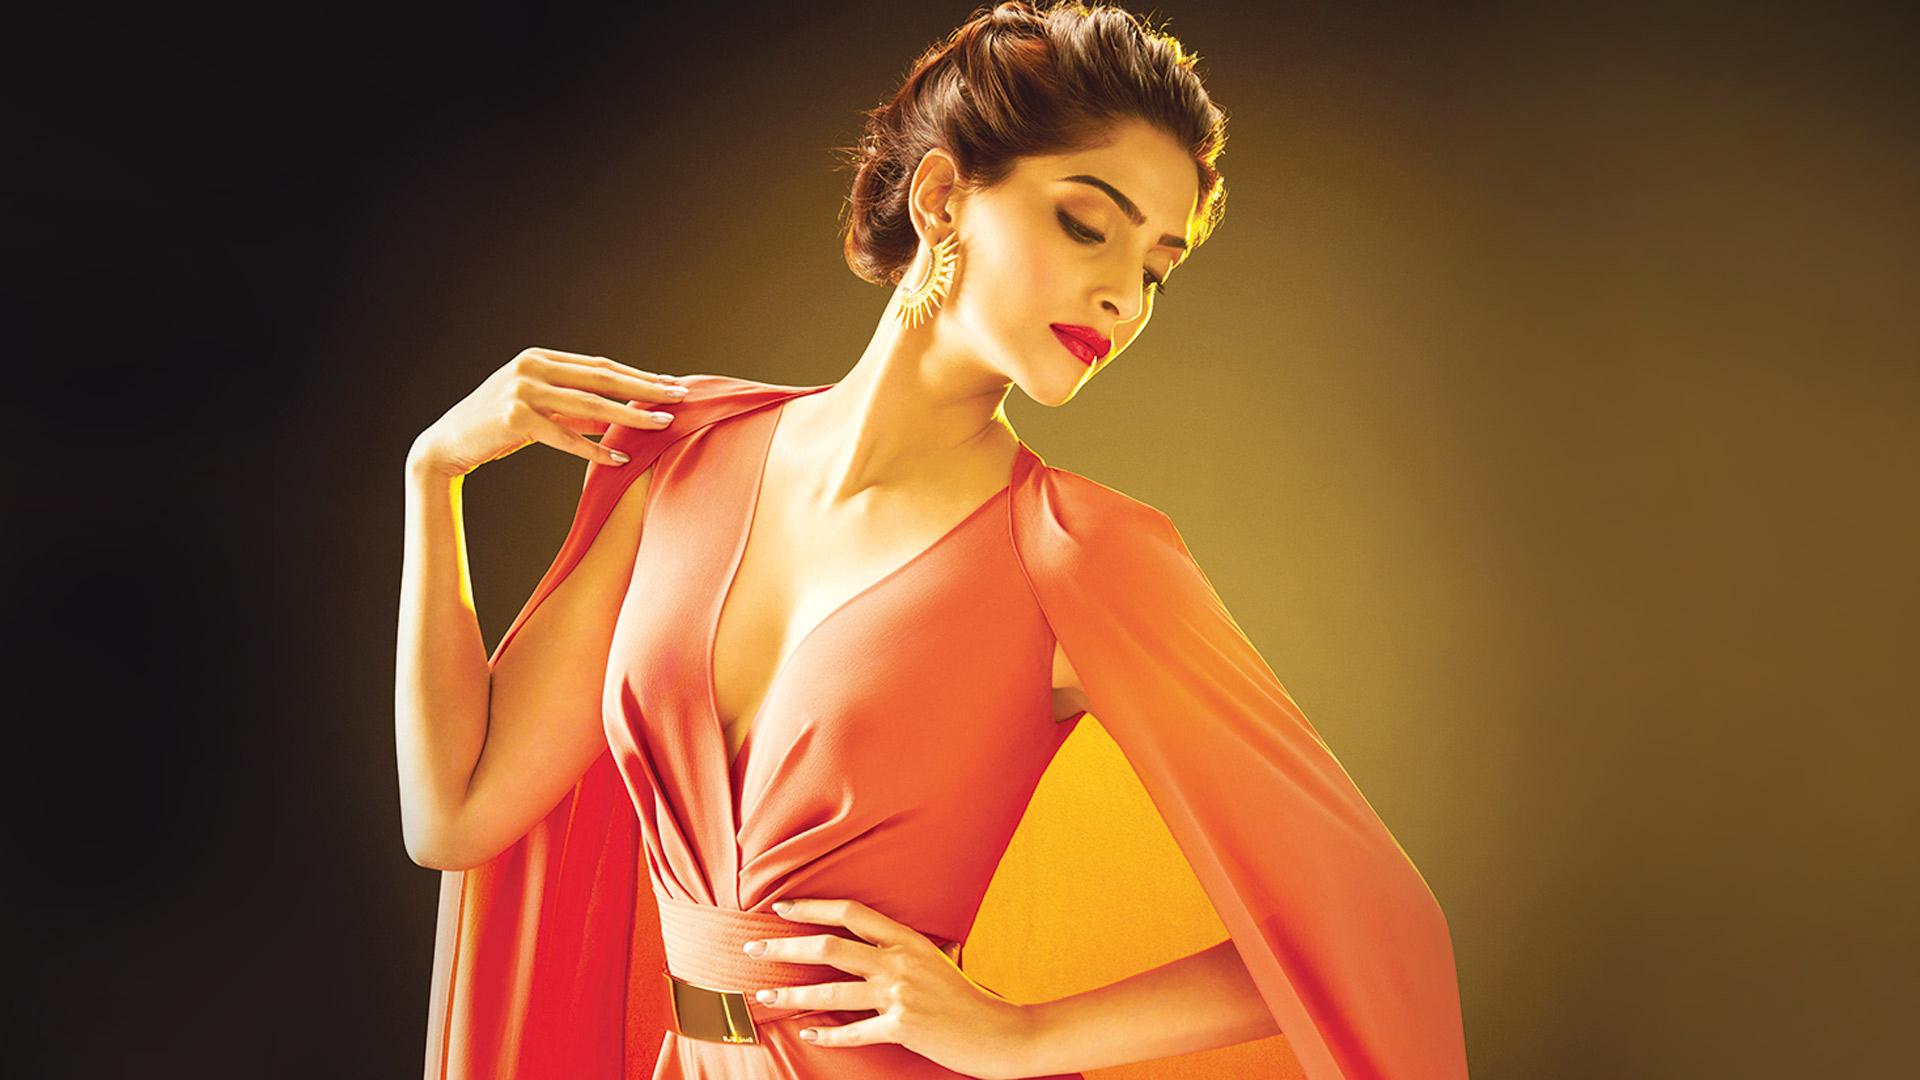 Sonam Kapoor Wallpapers: Sonam Wallpapers, Photos And Desktop Backgrounds Up To 8K